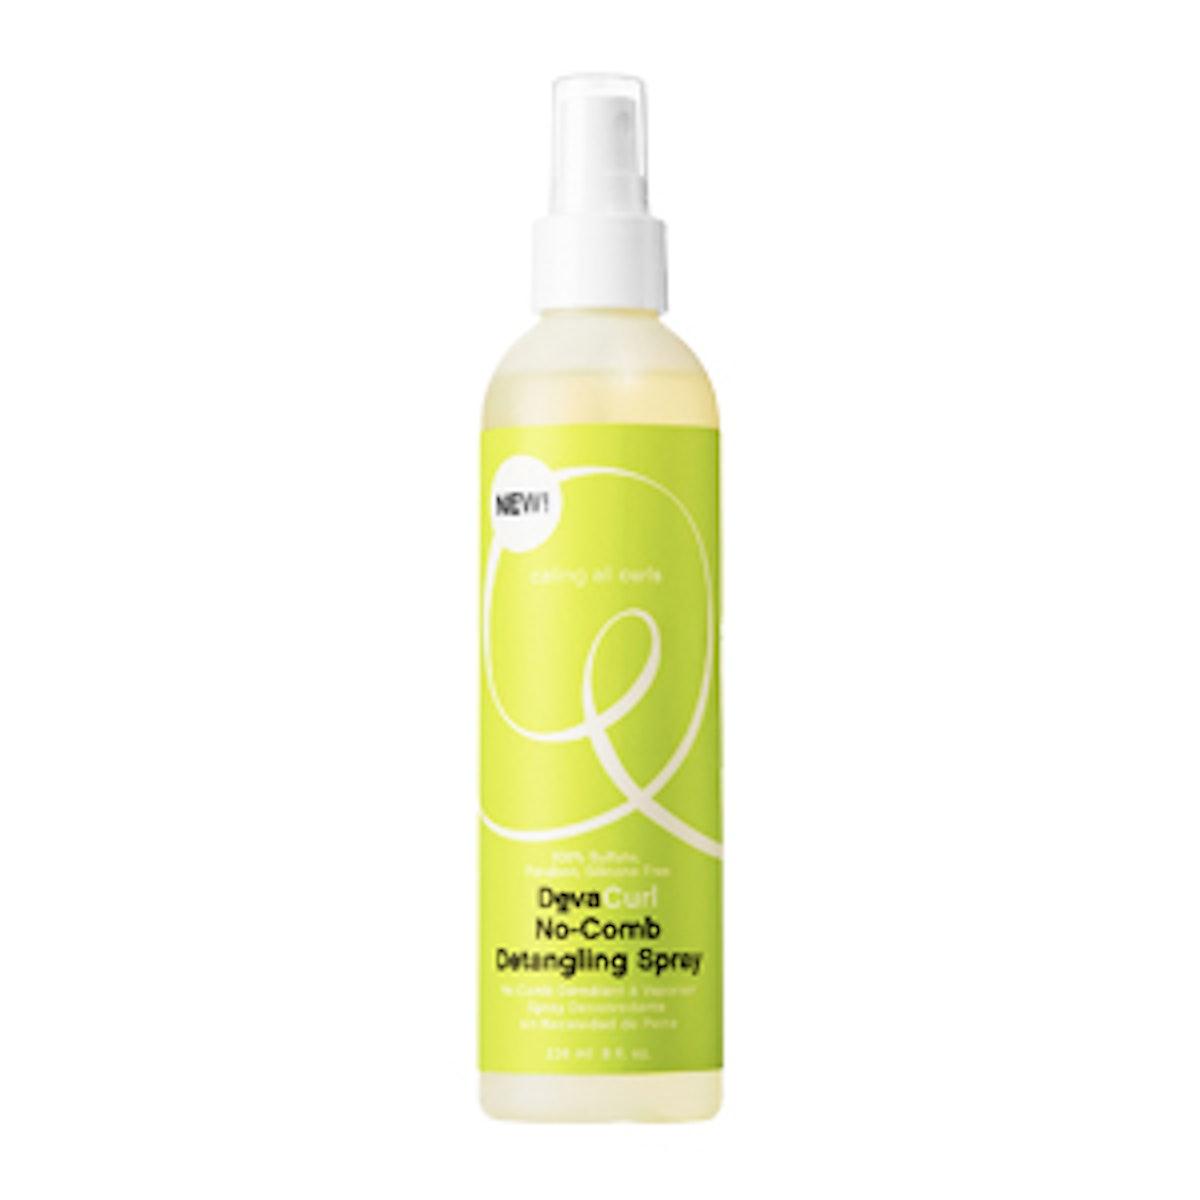 DevaCurl No-Comb Detangling Spray